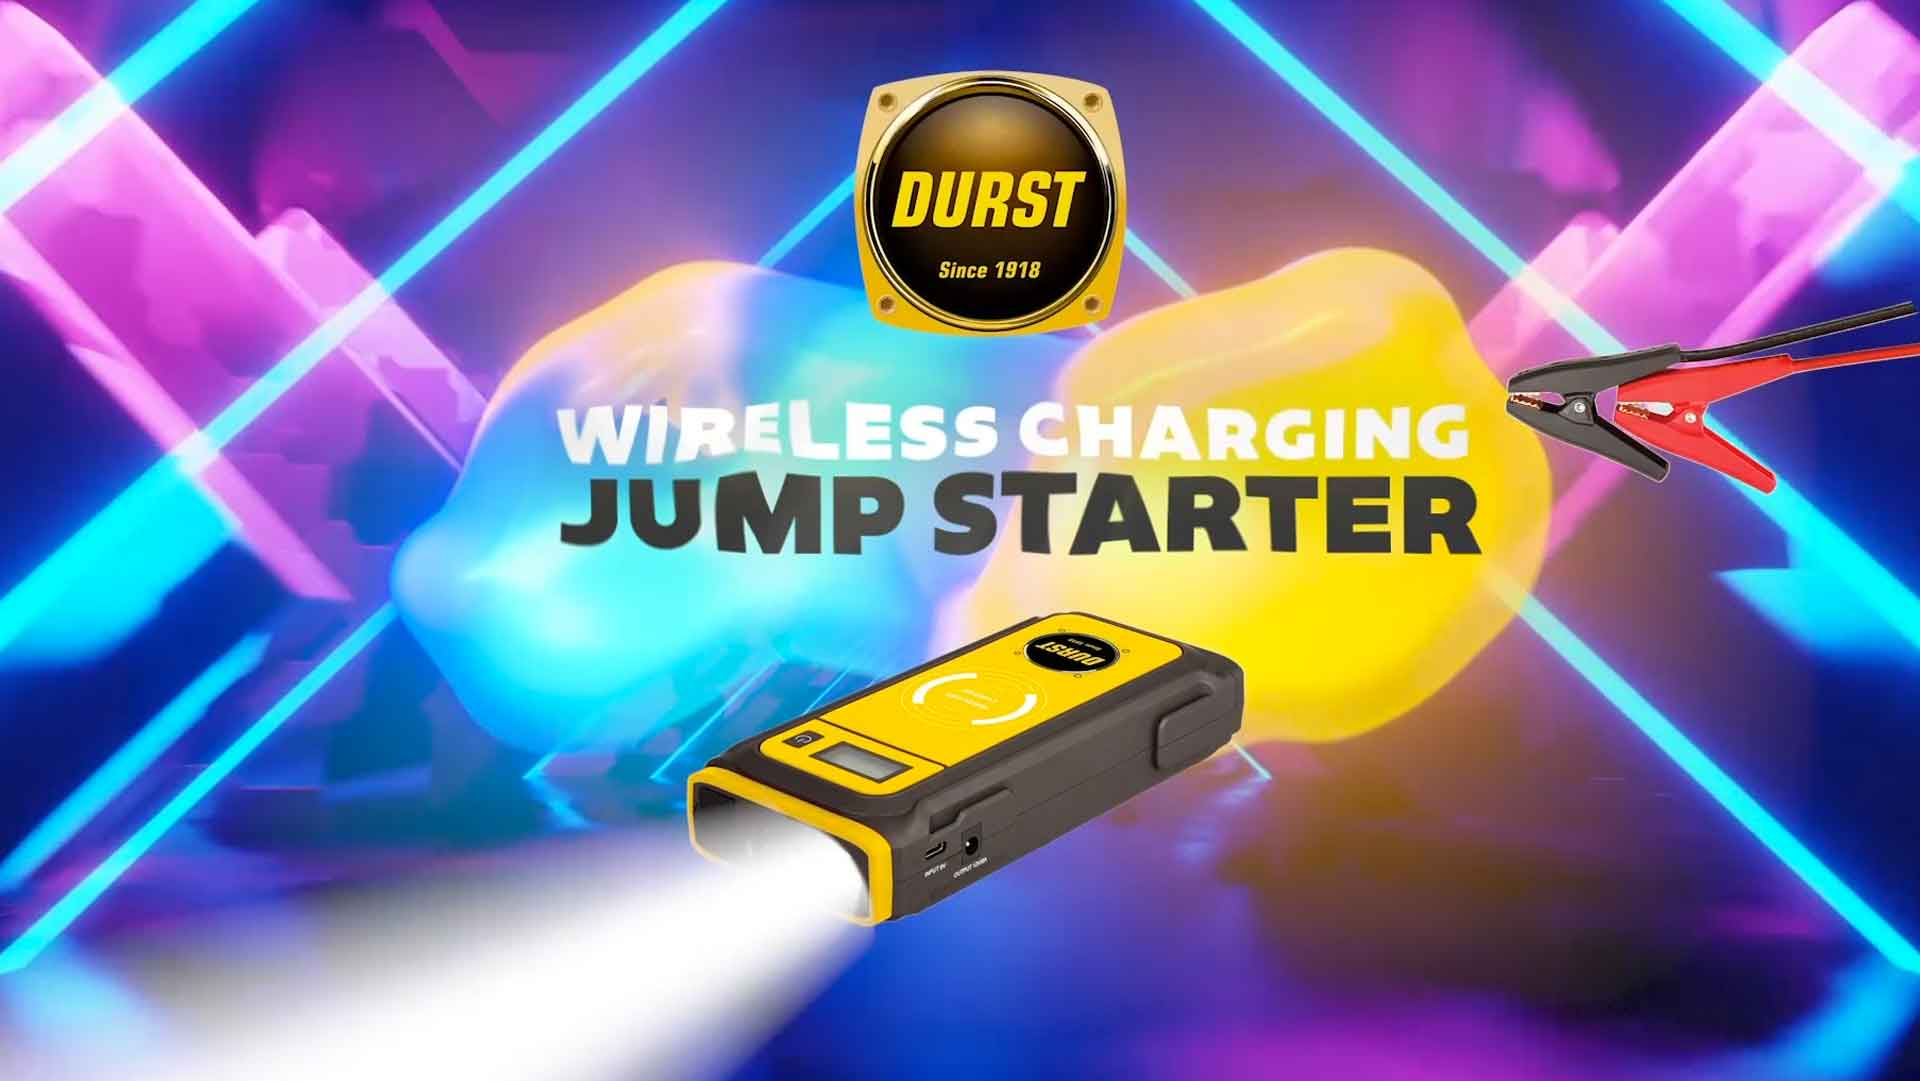 Jump Starter Wireless Charging banner